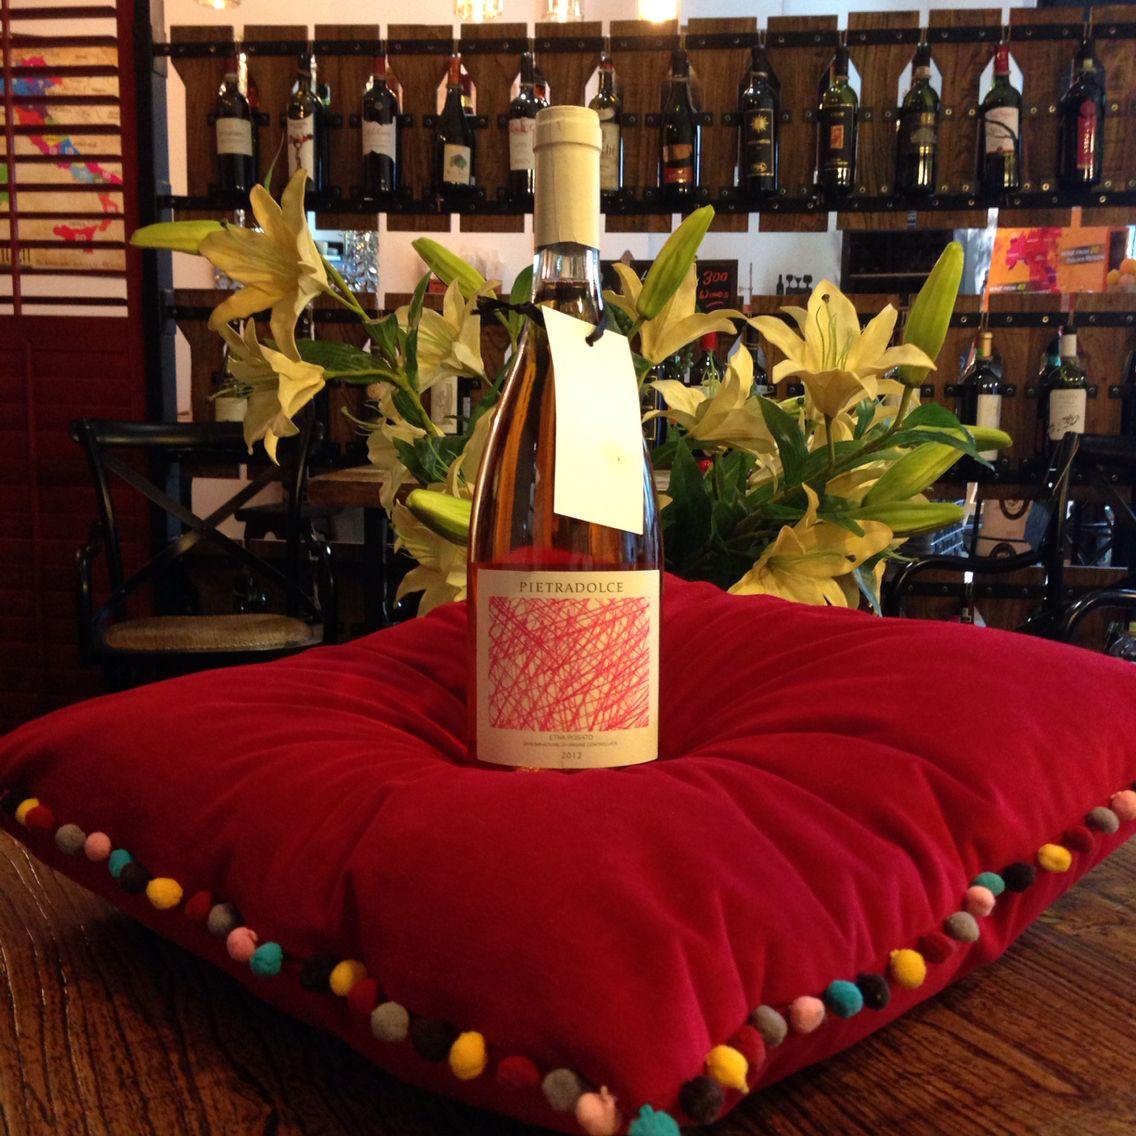 17 Nov 2015 Sjp Movie And Wine Tasting With Bacco Night Lucky Draw Prize Winner Fiona Corbett Won A Bottle Of De Wine Tasting Events Wine Tasting Italian Wine